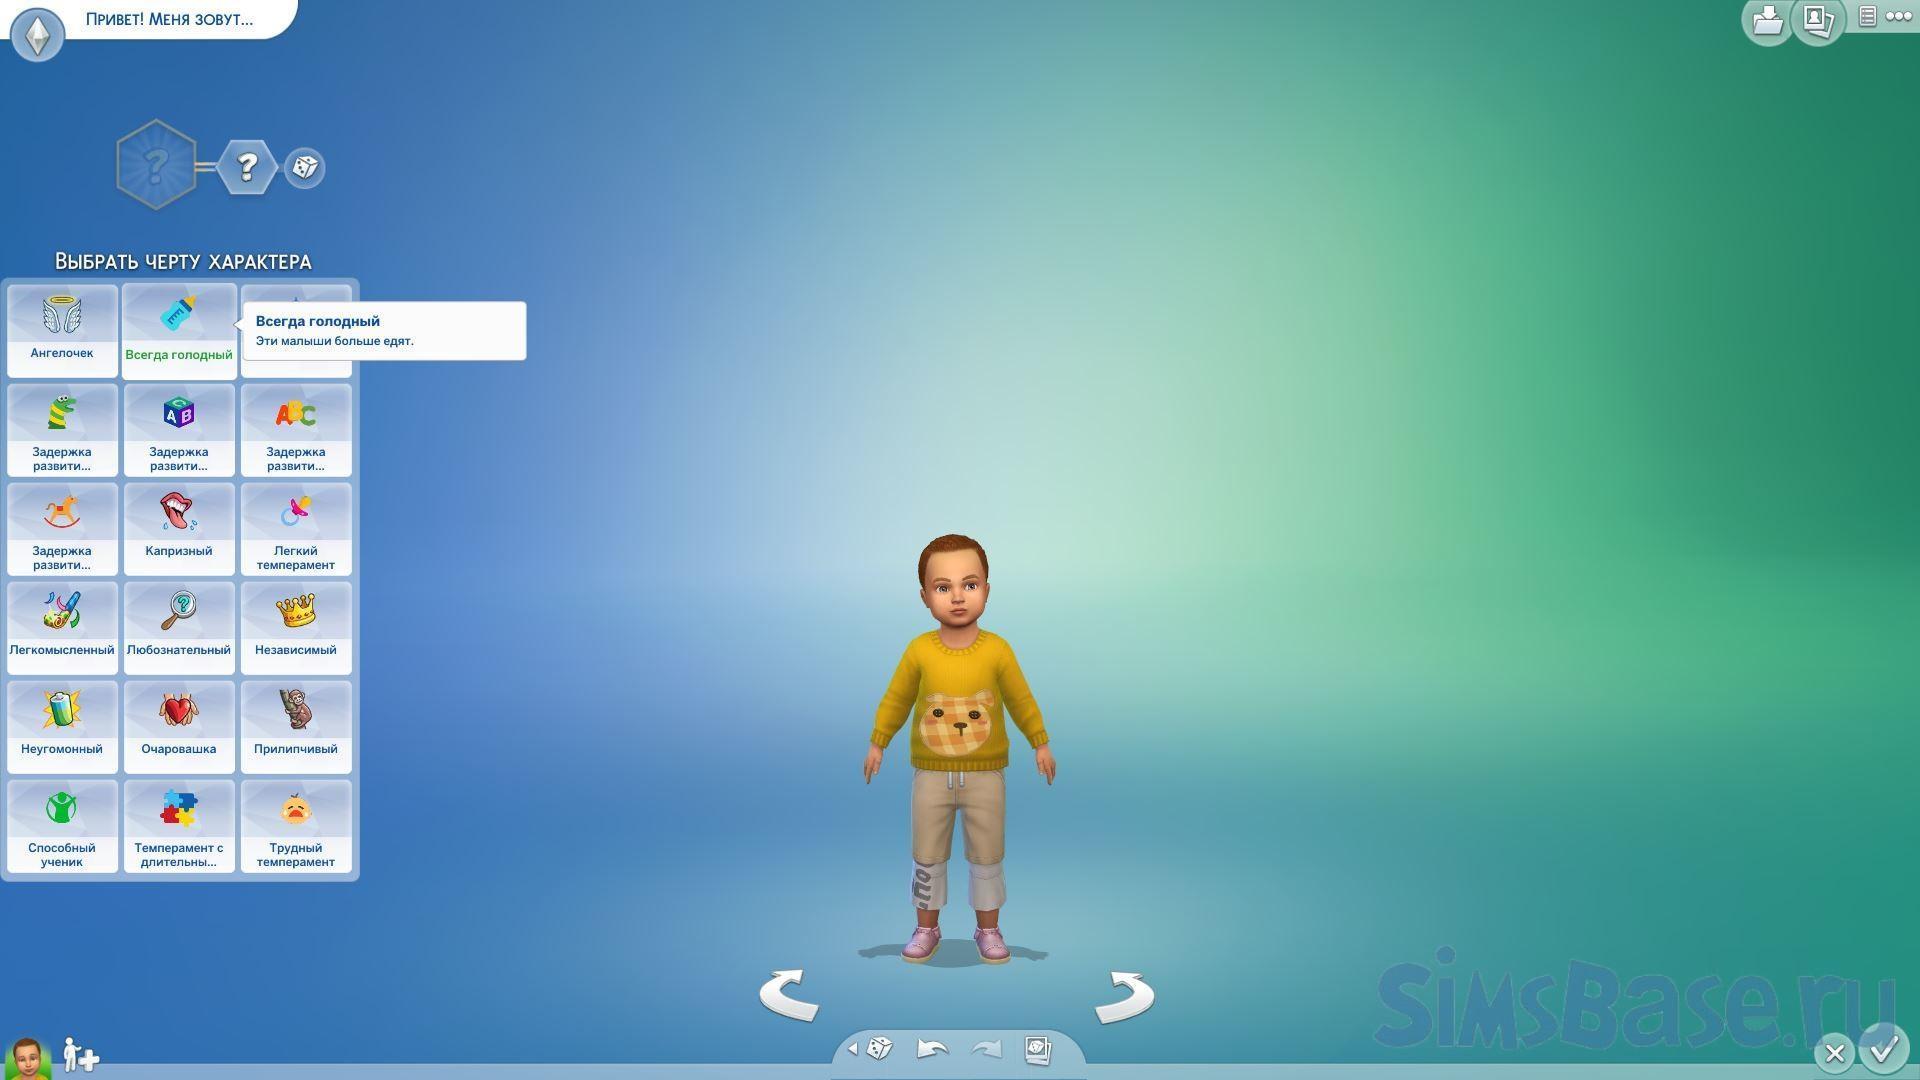 Мод «Черты характера и темпераменты для малышей» от Vicky Sims для Sims 4